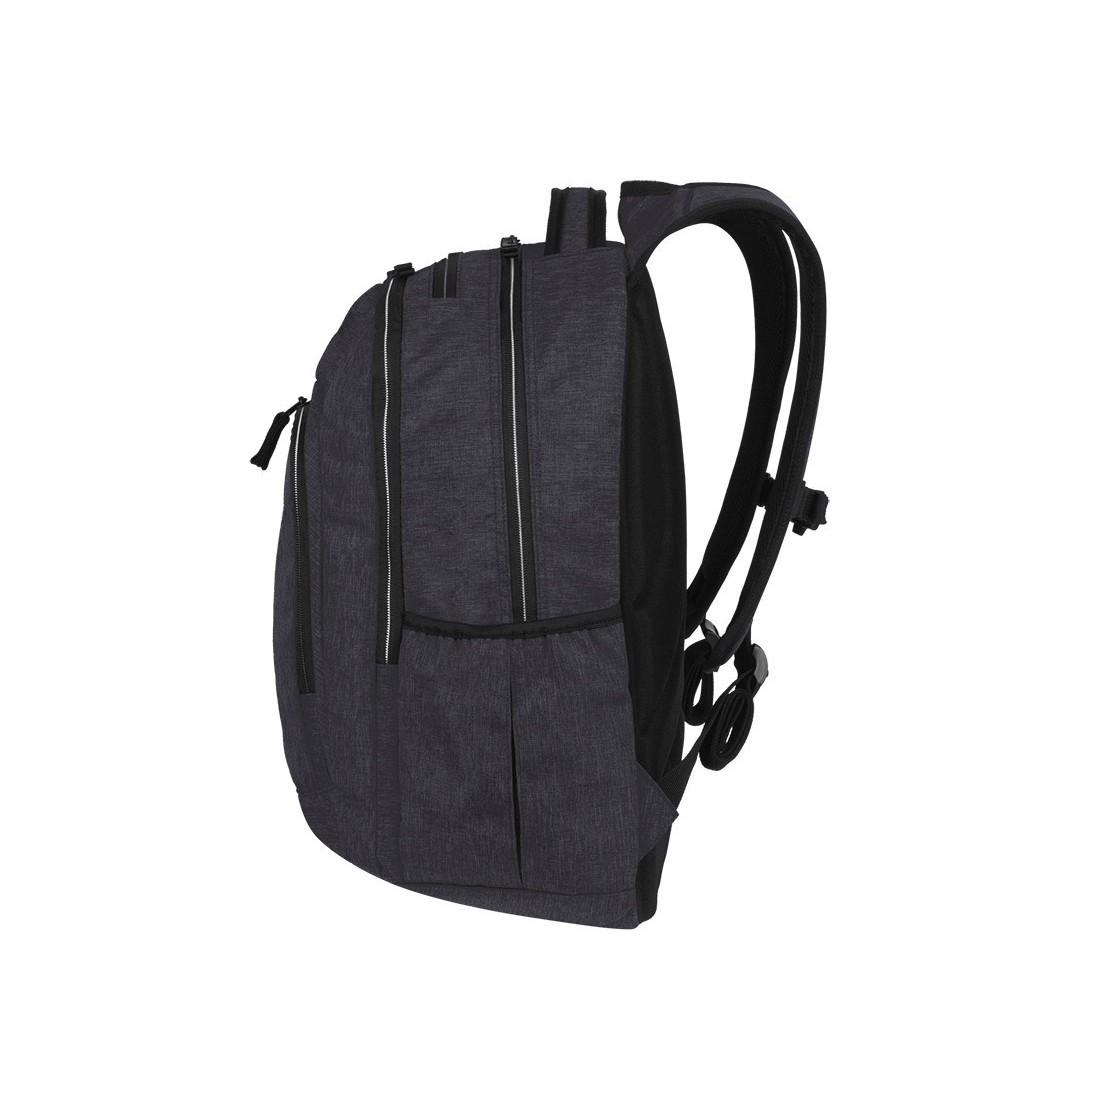 d8b077b3f4473 ... Plecak szkolny na laptop grafitowy   czarny CoolPack CP MERCATOR PLUS  SNOW BLACK   SILVER ...